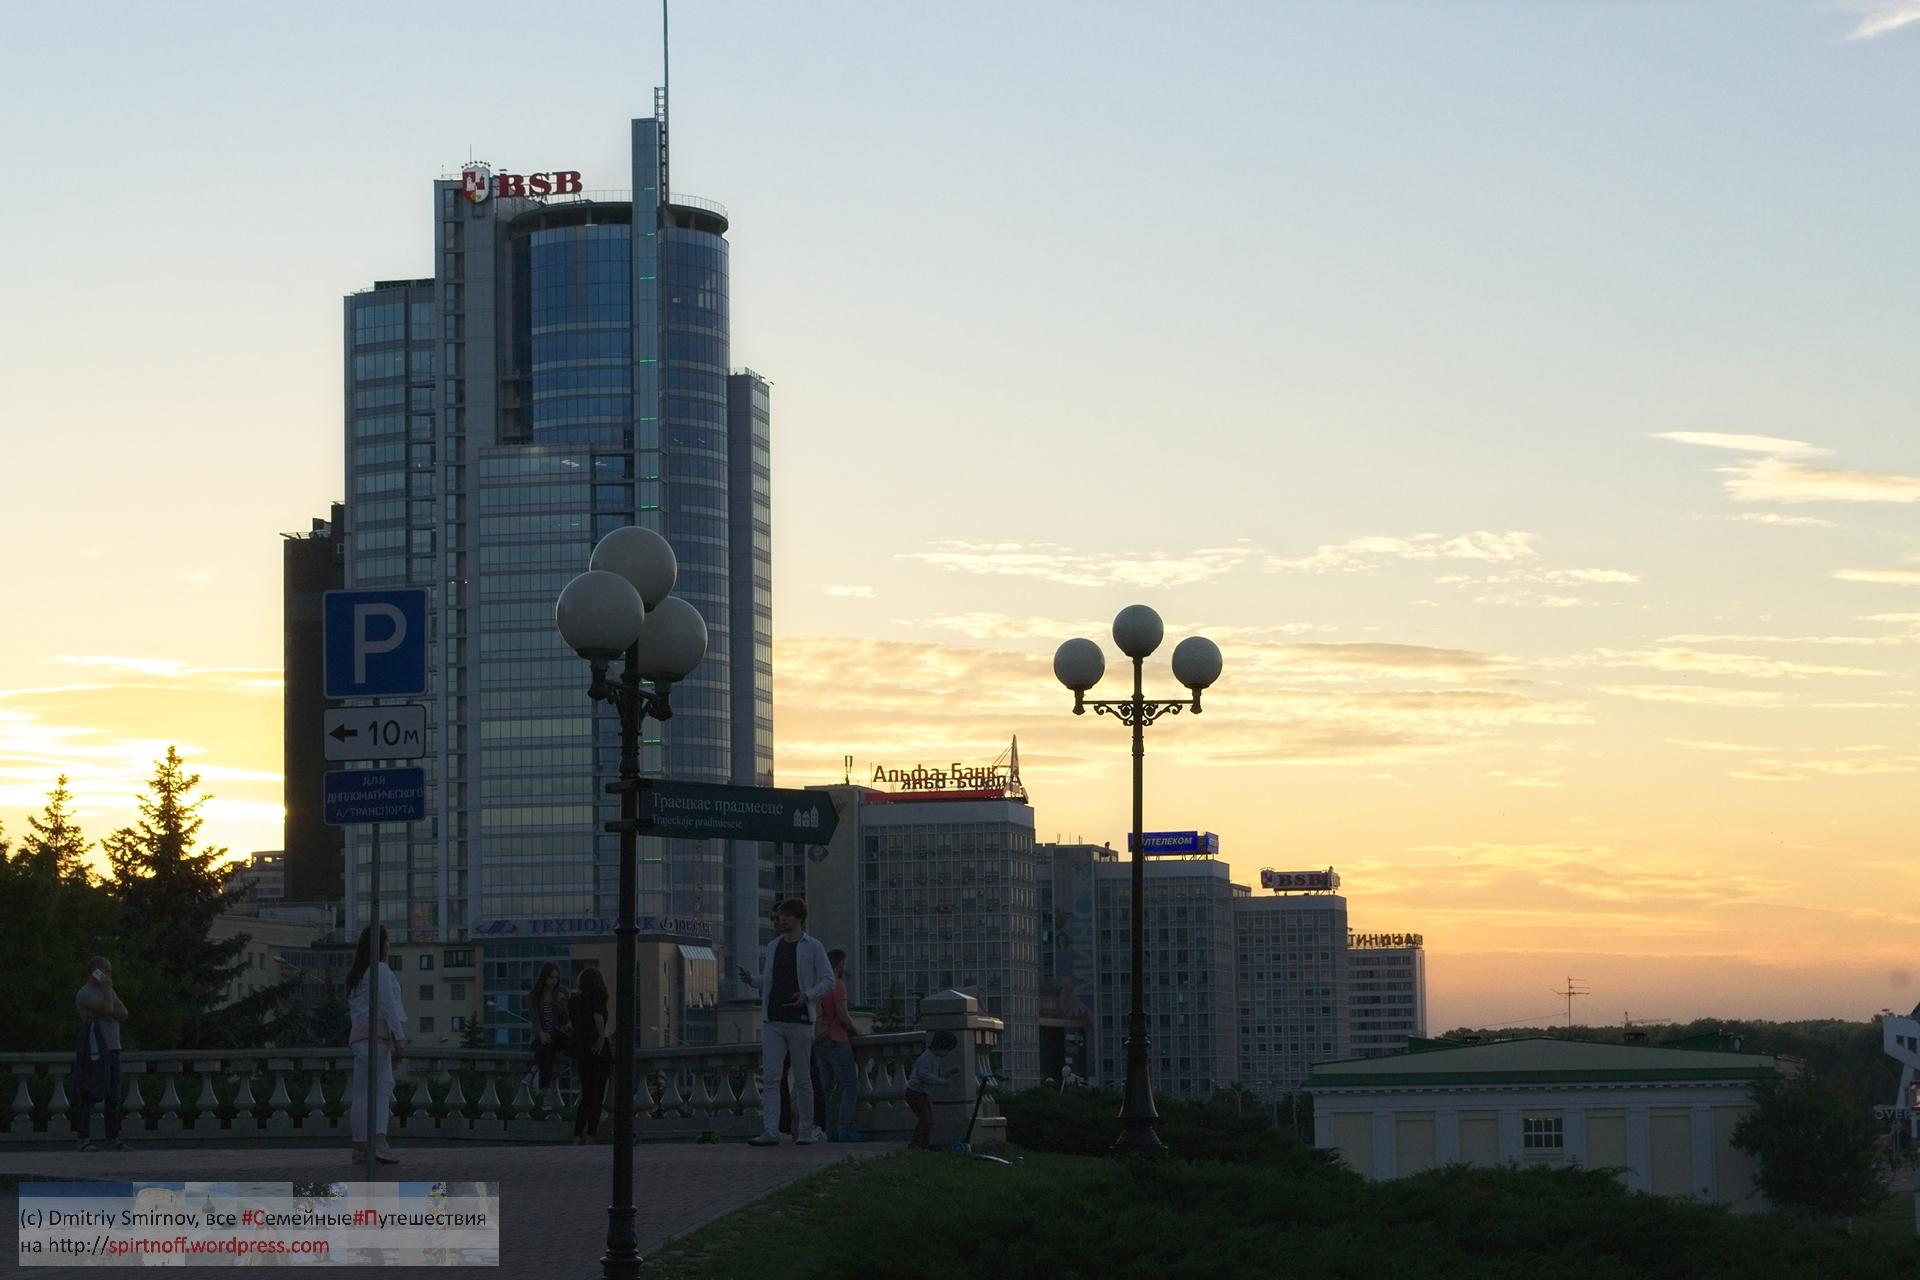 DSC_7250-59-Blog-55 Путешествия  Минск. Закат и город